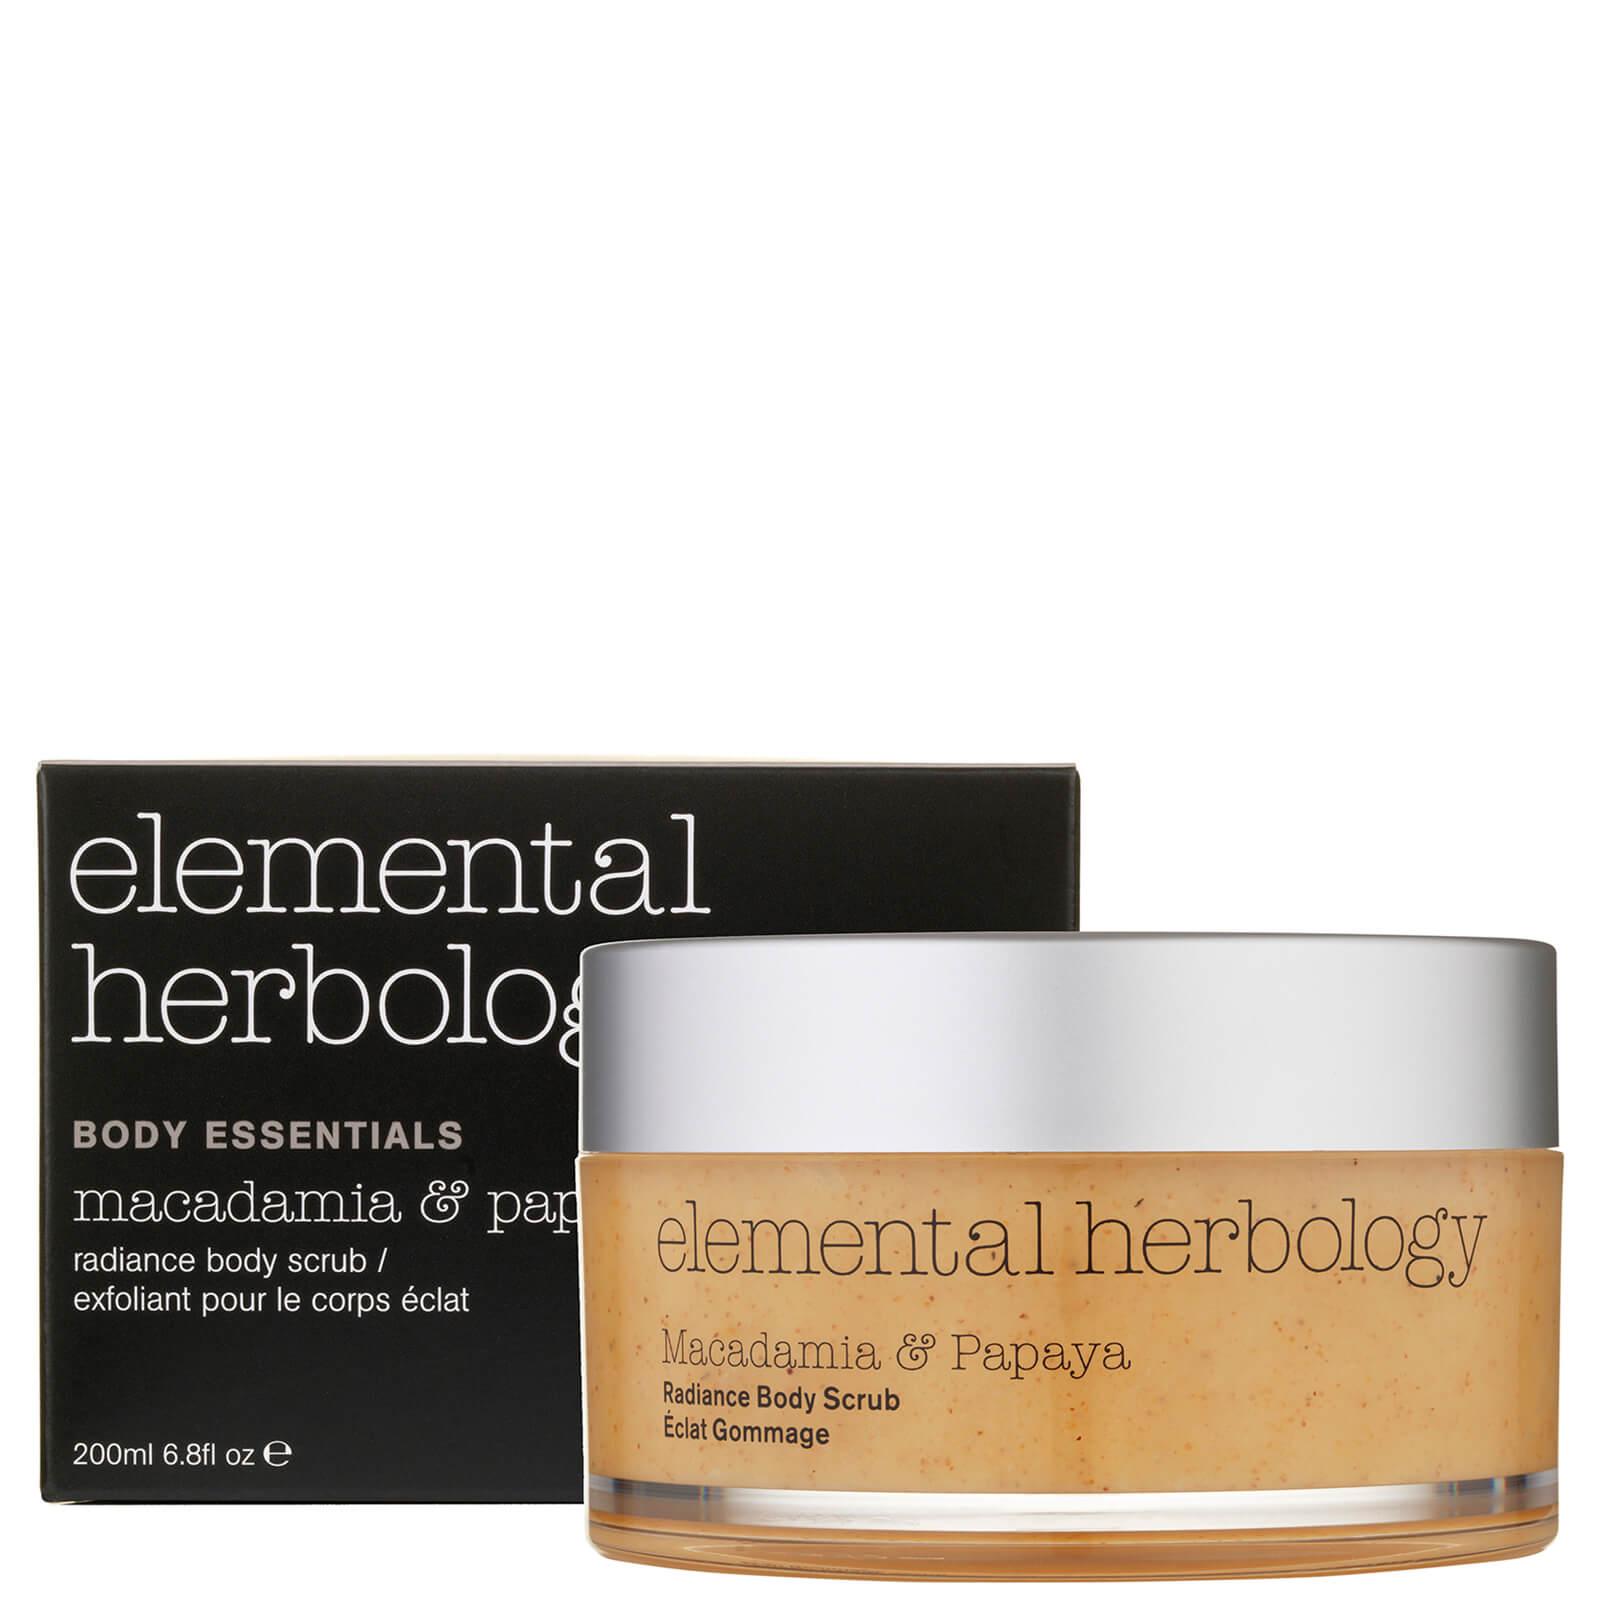 Elemental Herbology Macadamia And Papaya Body Scrub 200ml Beautyexpert Marina Product Description